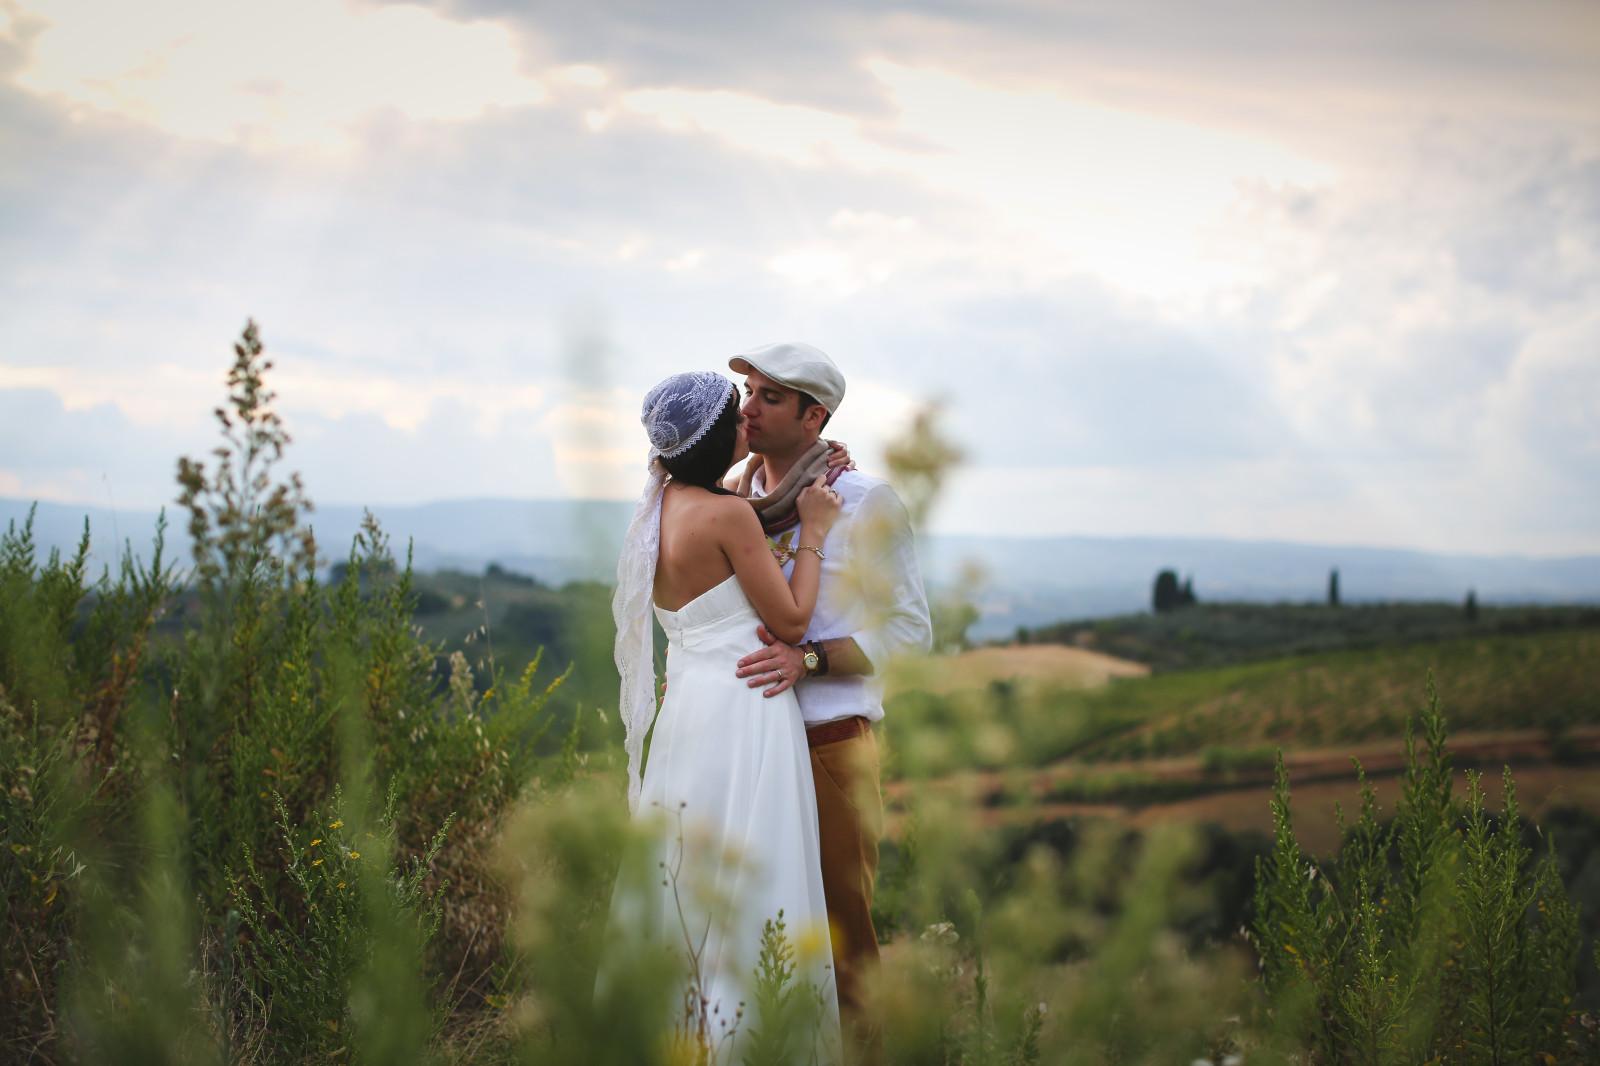 Reportage {Anne-Sophie & Hervé} : Mariage Champêtre chic en Toscane